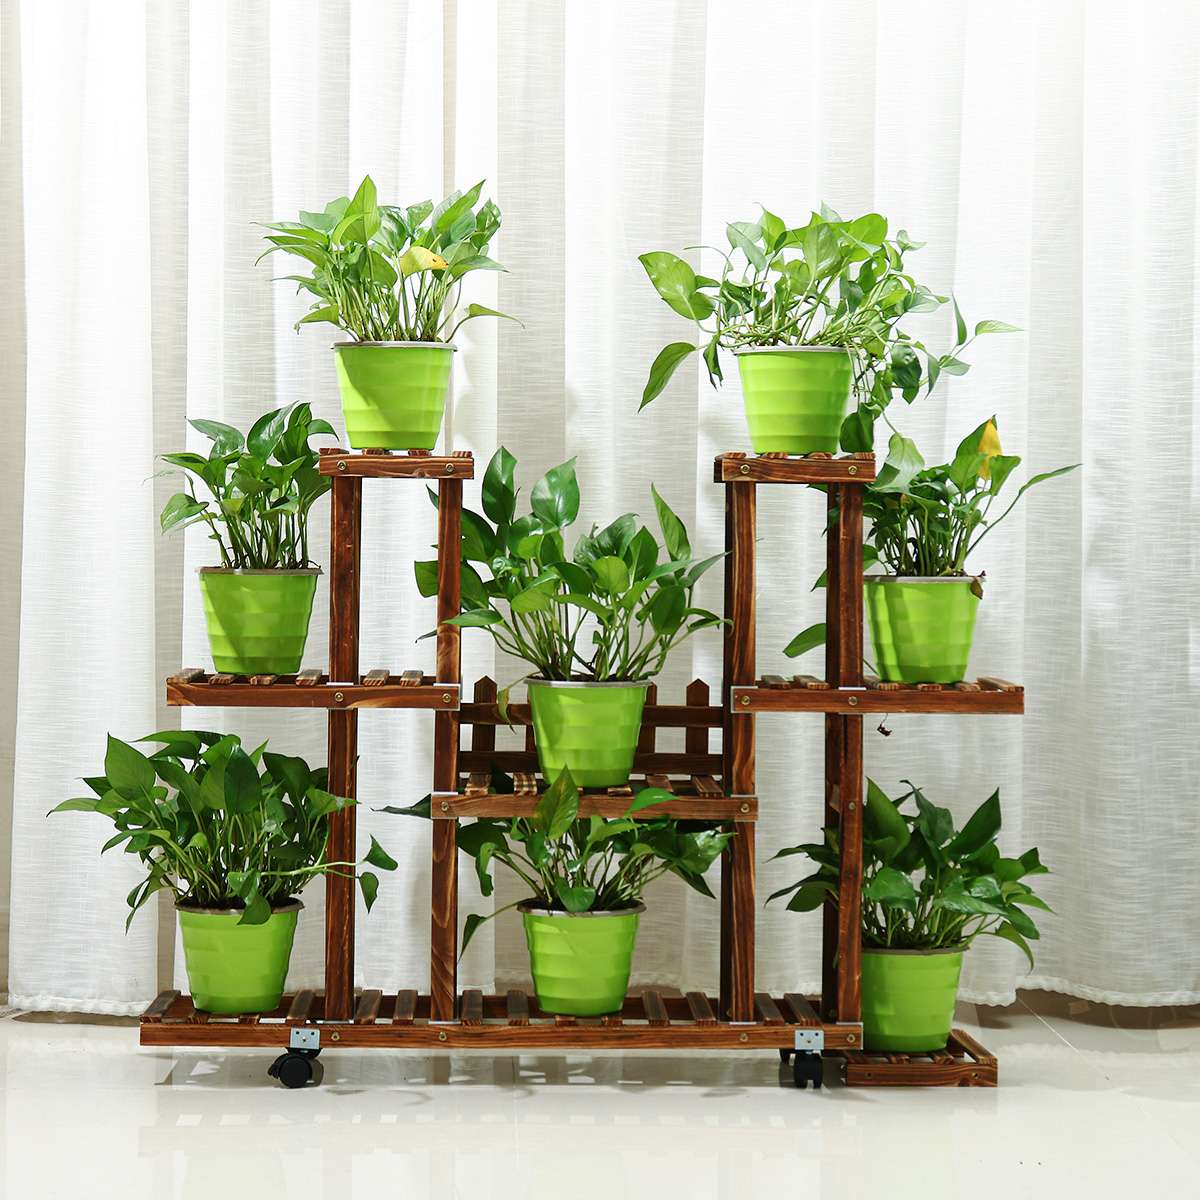 Wooden Flower Rack Plant Stand Display Shelves Storage Organizer Decoration Multi-layer Yard Garden Patio Balcony Flower Stands